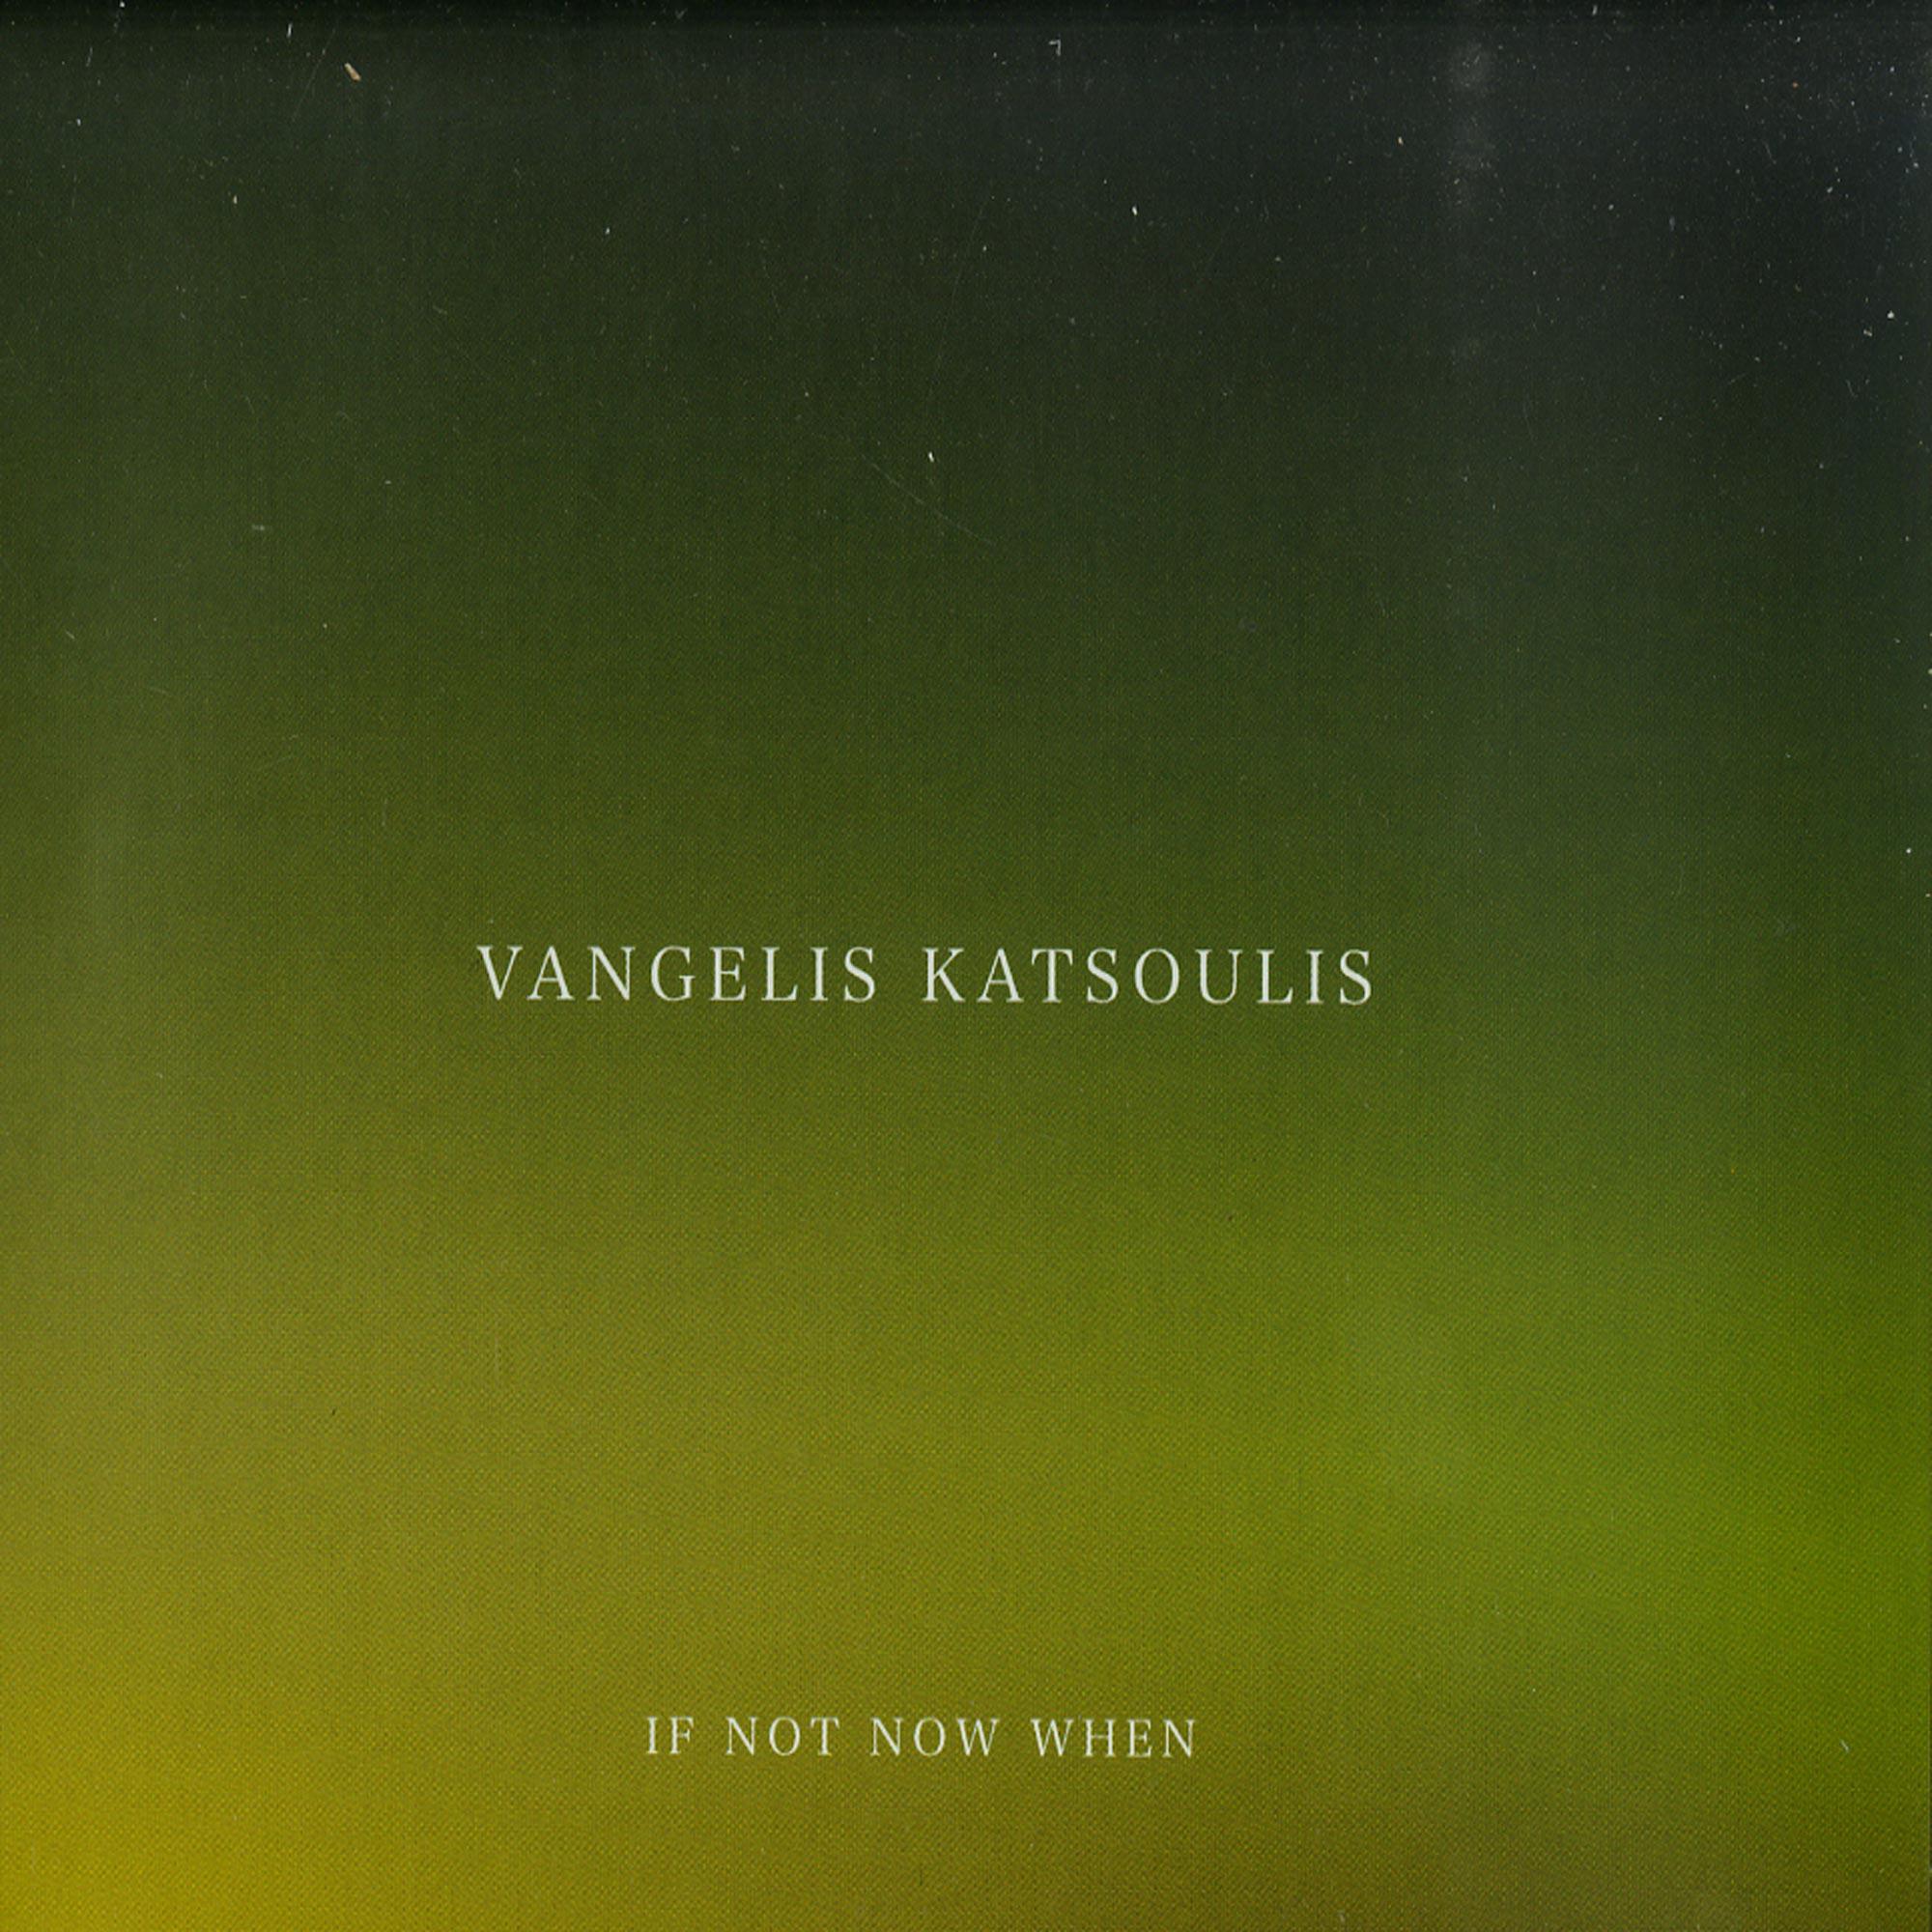 Vangelis Katsoulis - IF NOT KNOW WHEN